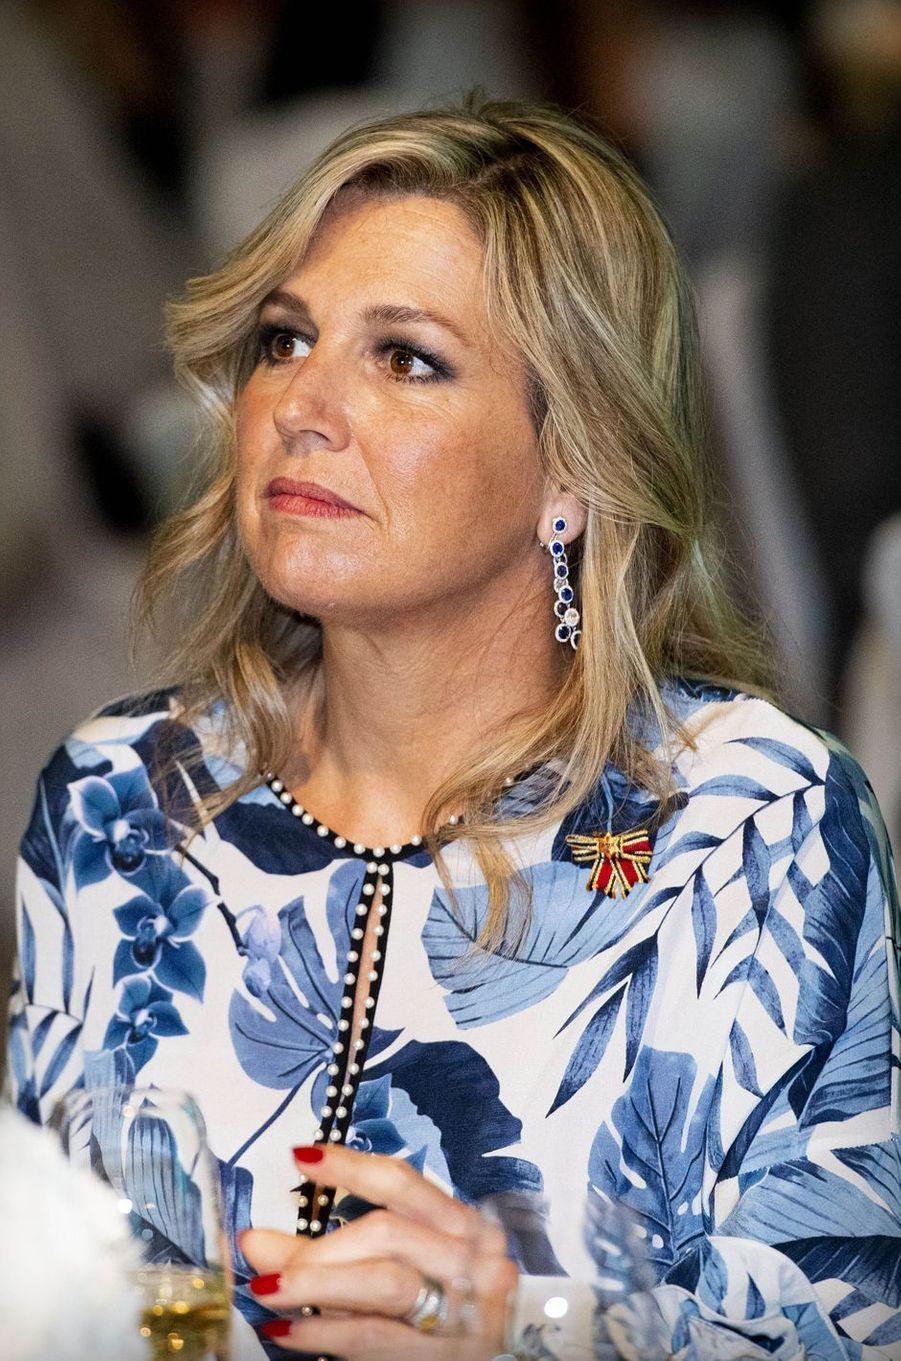 La reine Maxima des Pays-Bas à Warnemünde, le 20 mai 2019